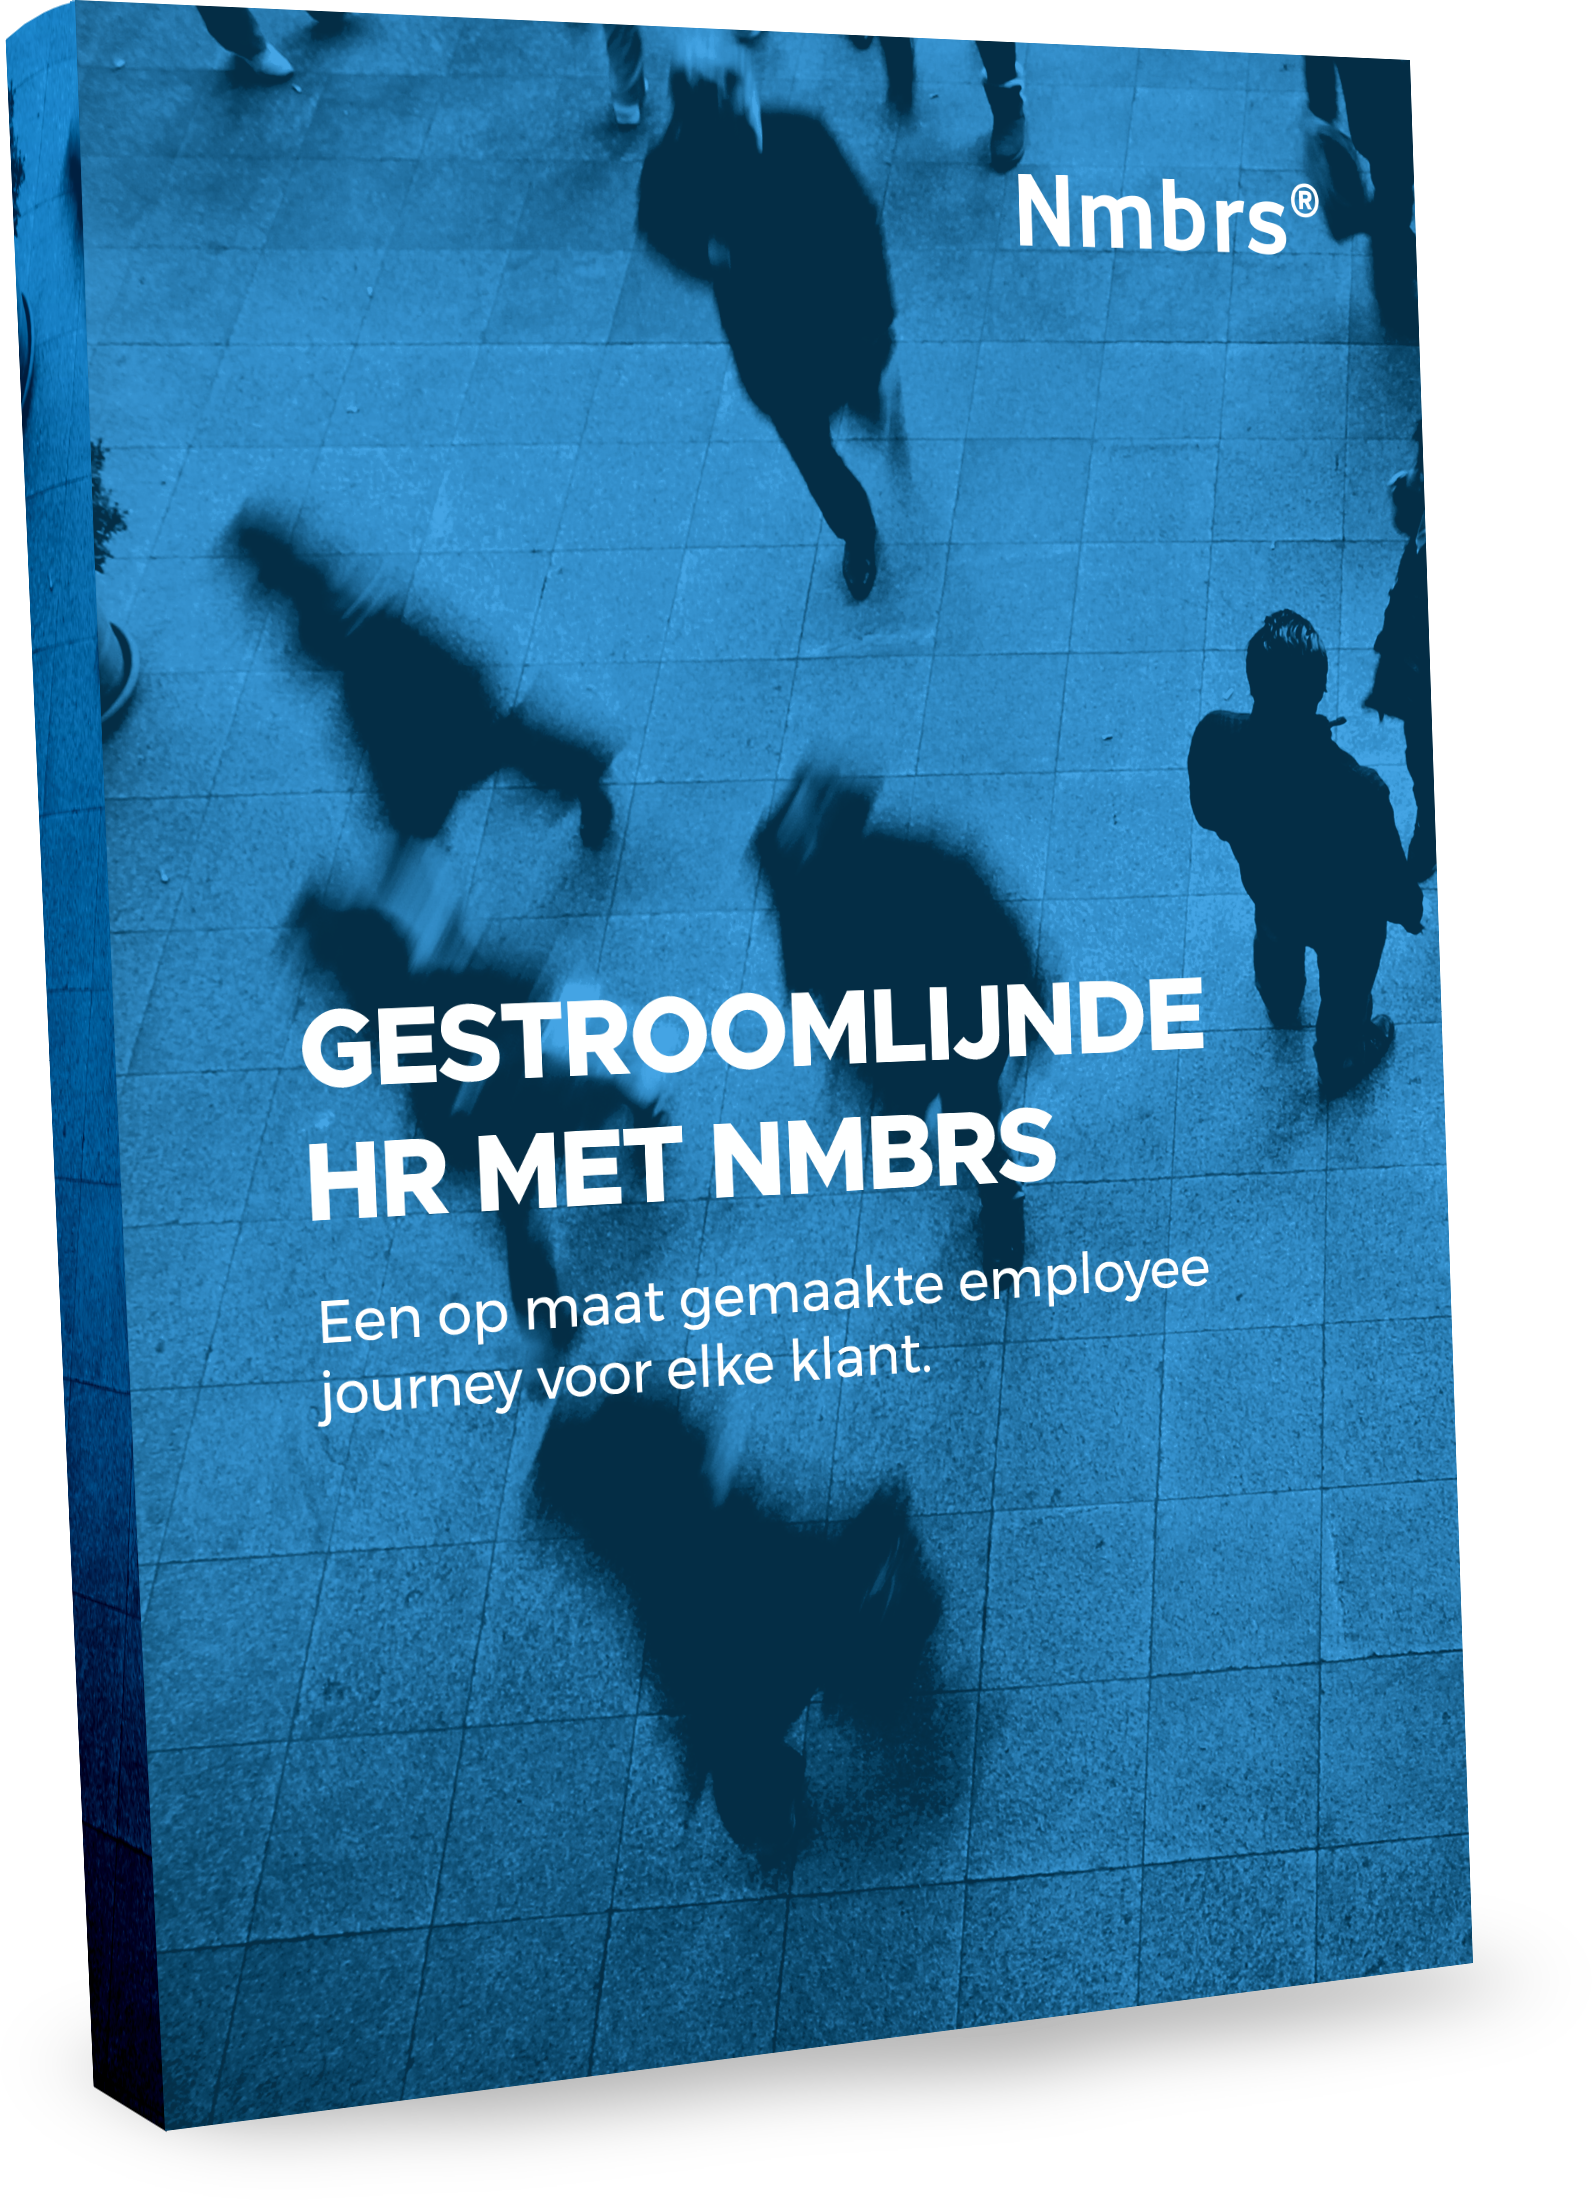 nmbrs-whitepaper-GestroomlijndeHRmetNmbrs-book-banner